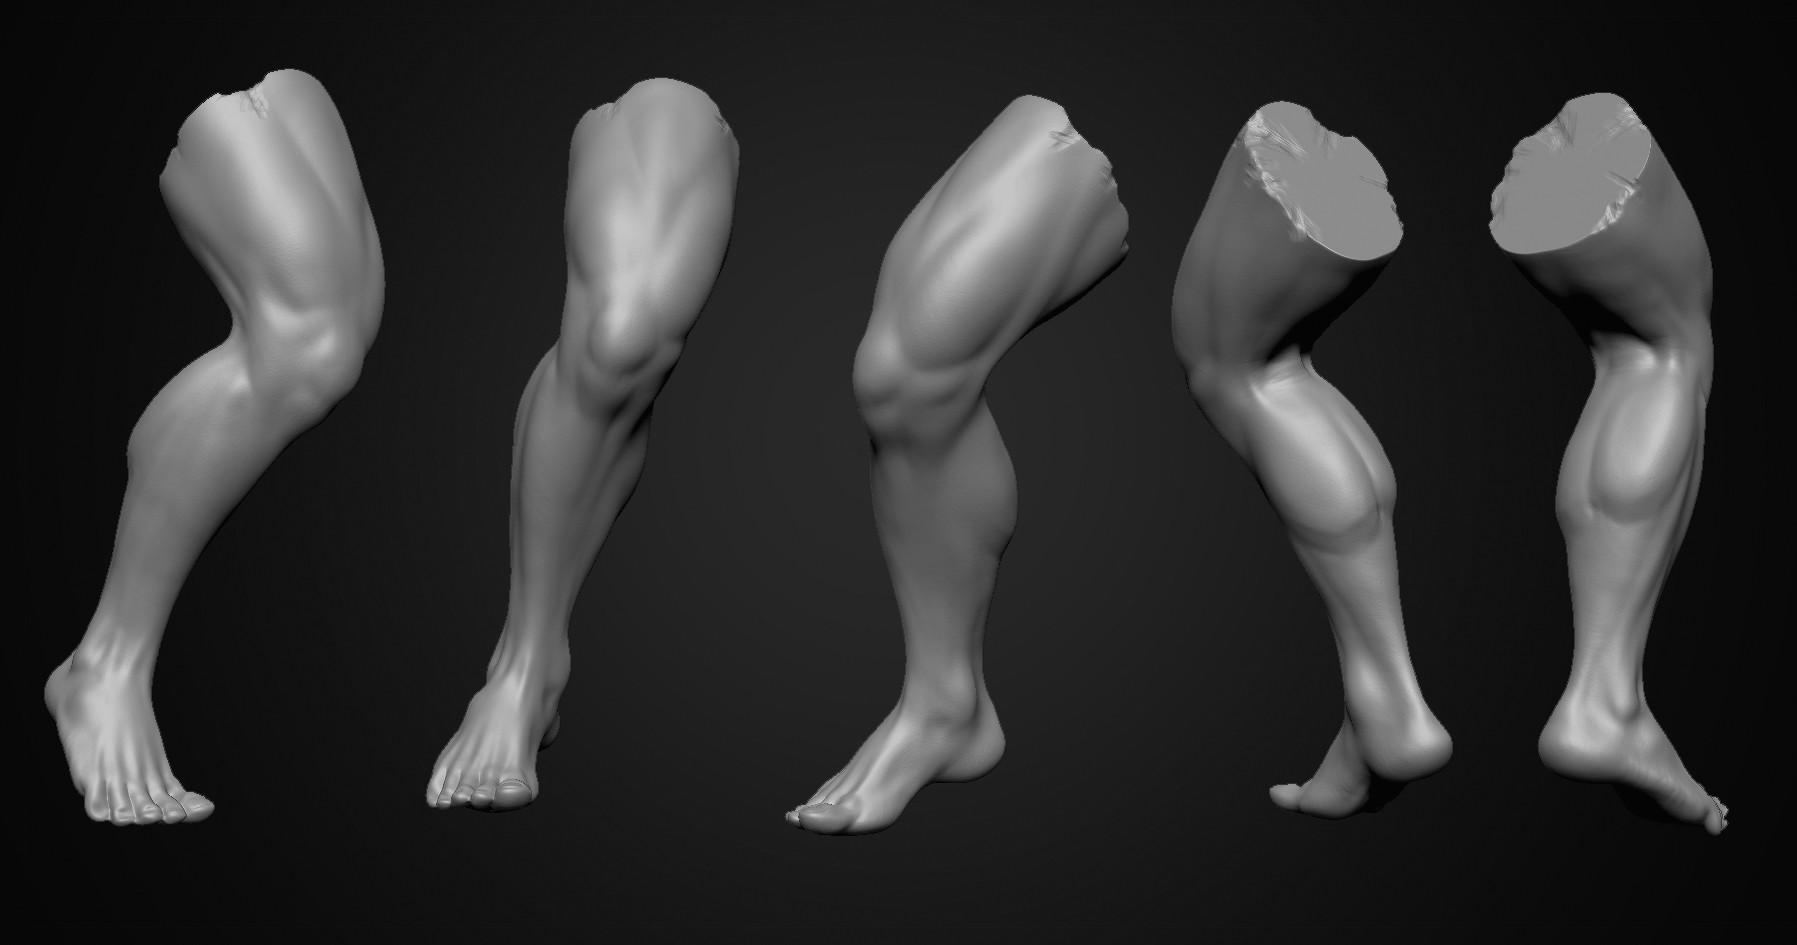 Jae wook Park - Low leg anatomy study